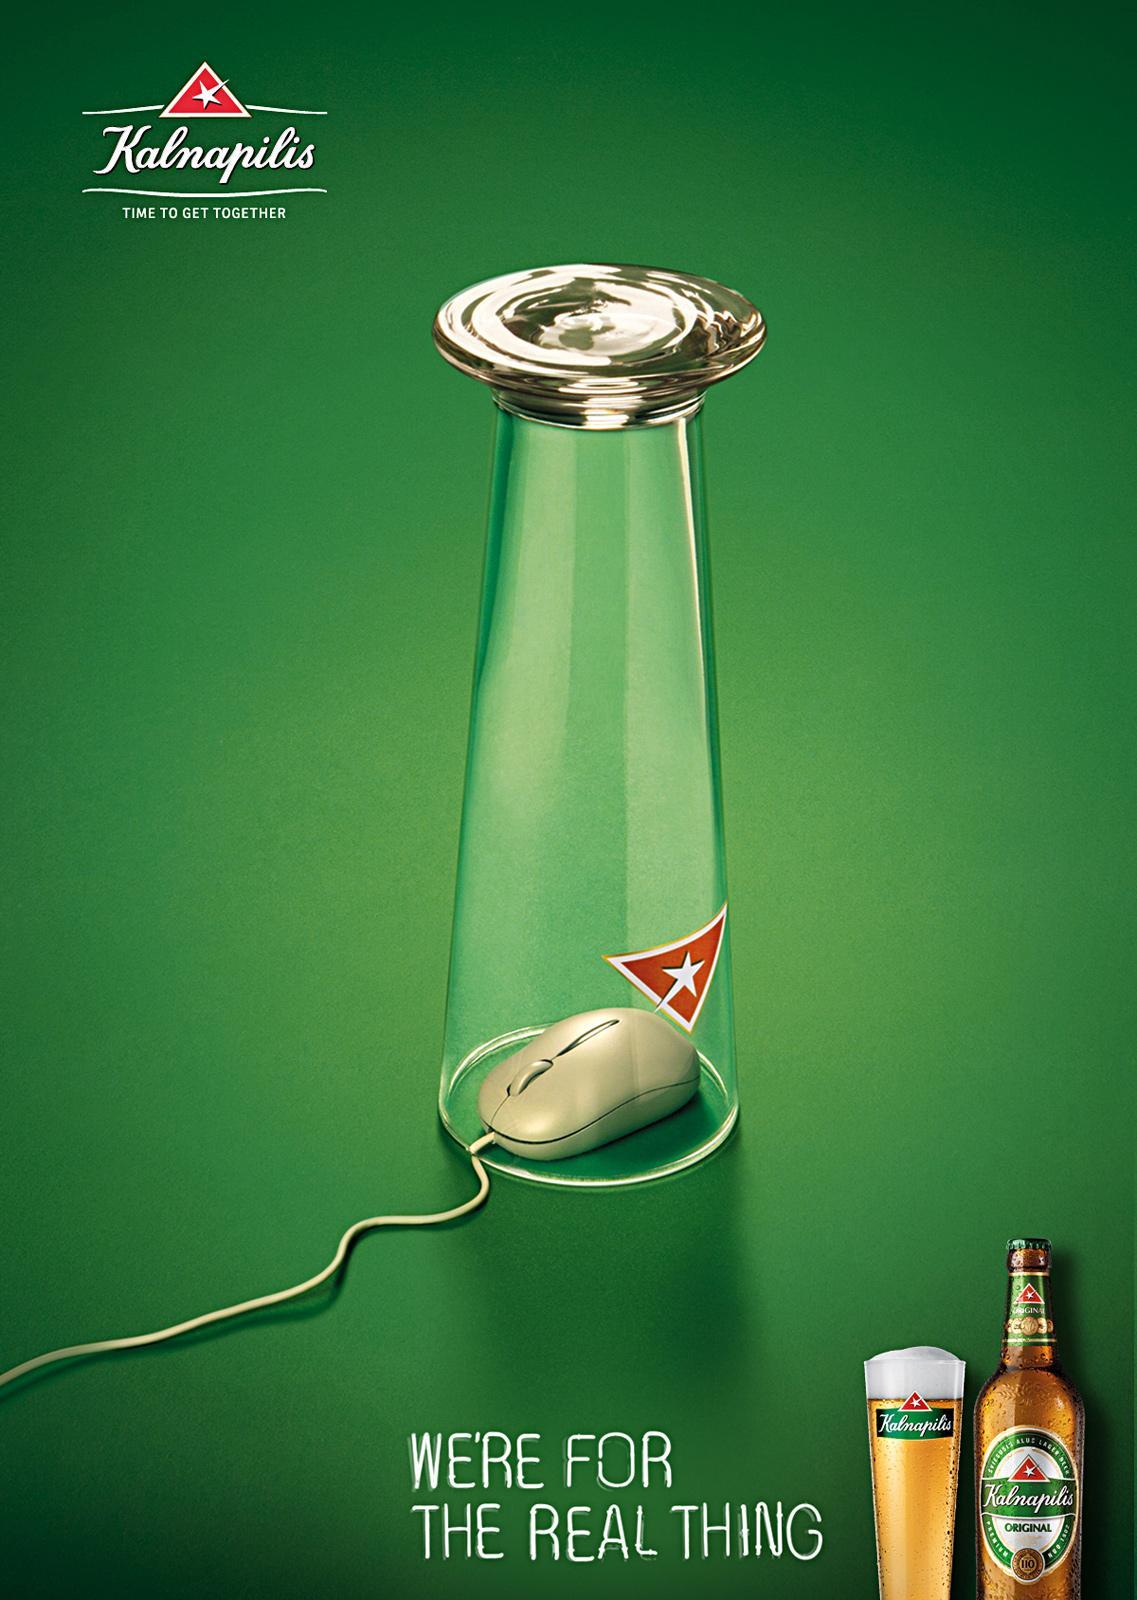 Kalnapilis Print Ad -  Mouse, 1